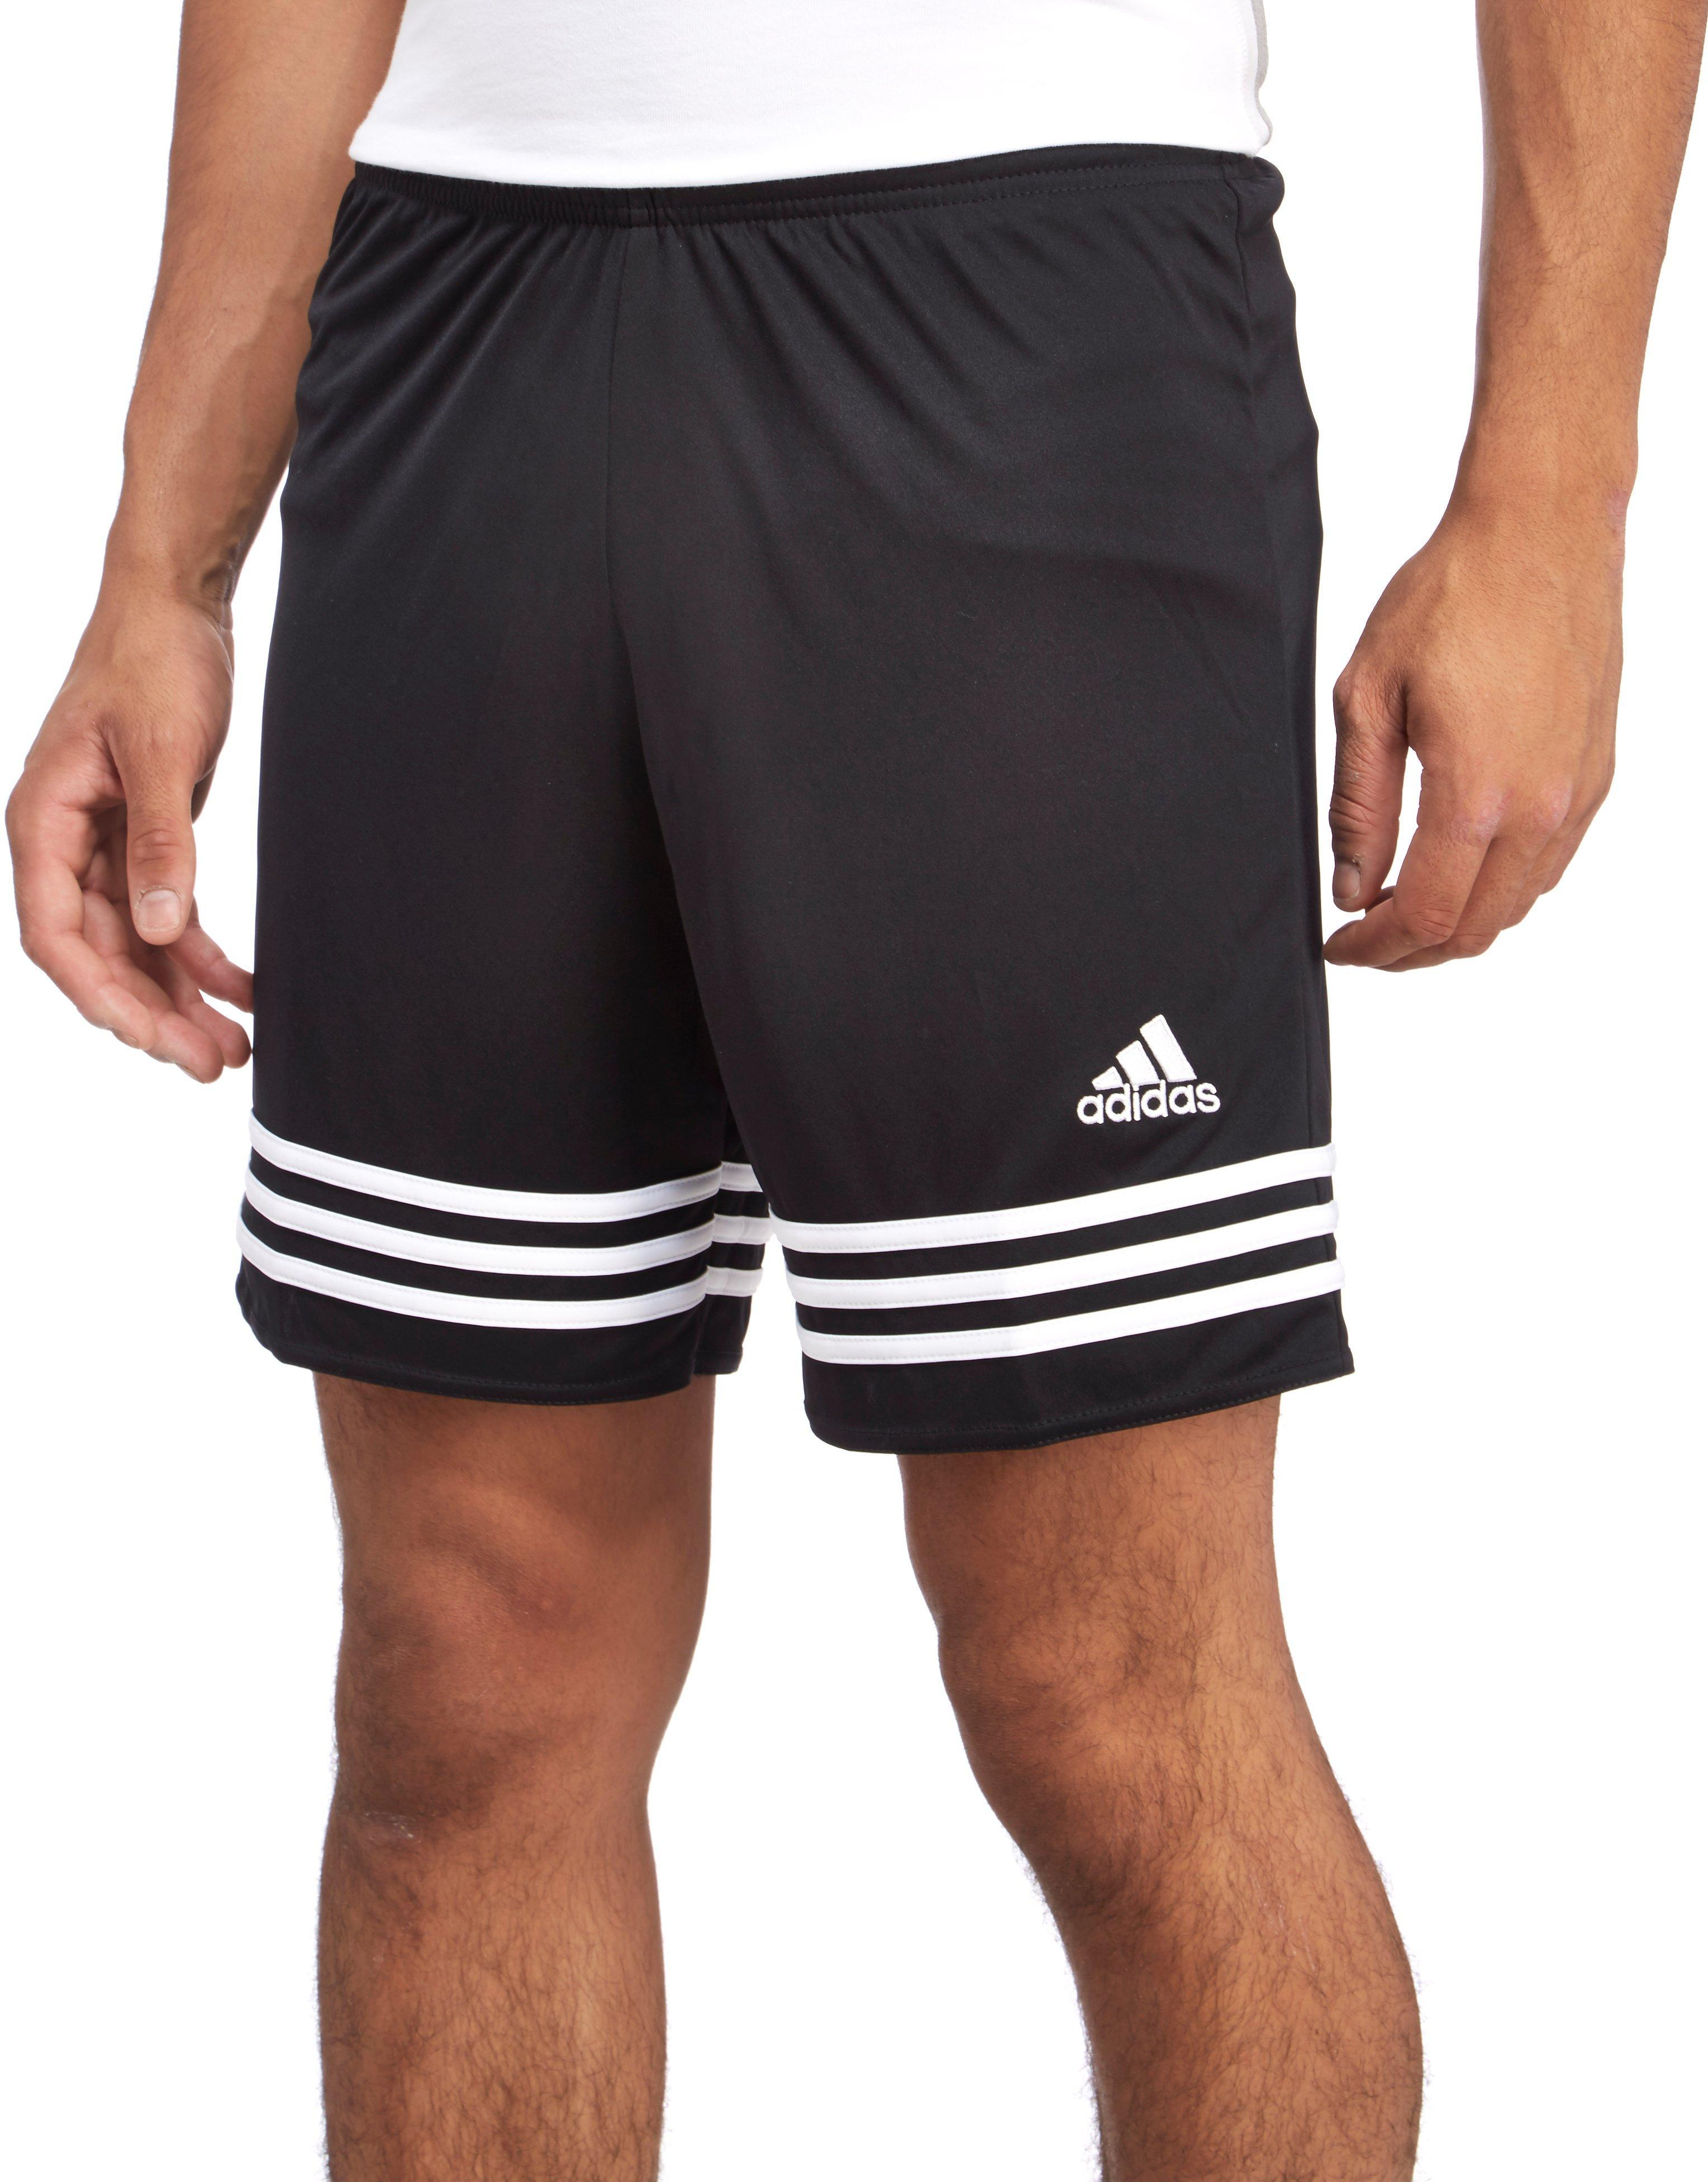 Lyst - Adidas Entrada Poly Shorts in Black for Men